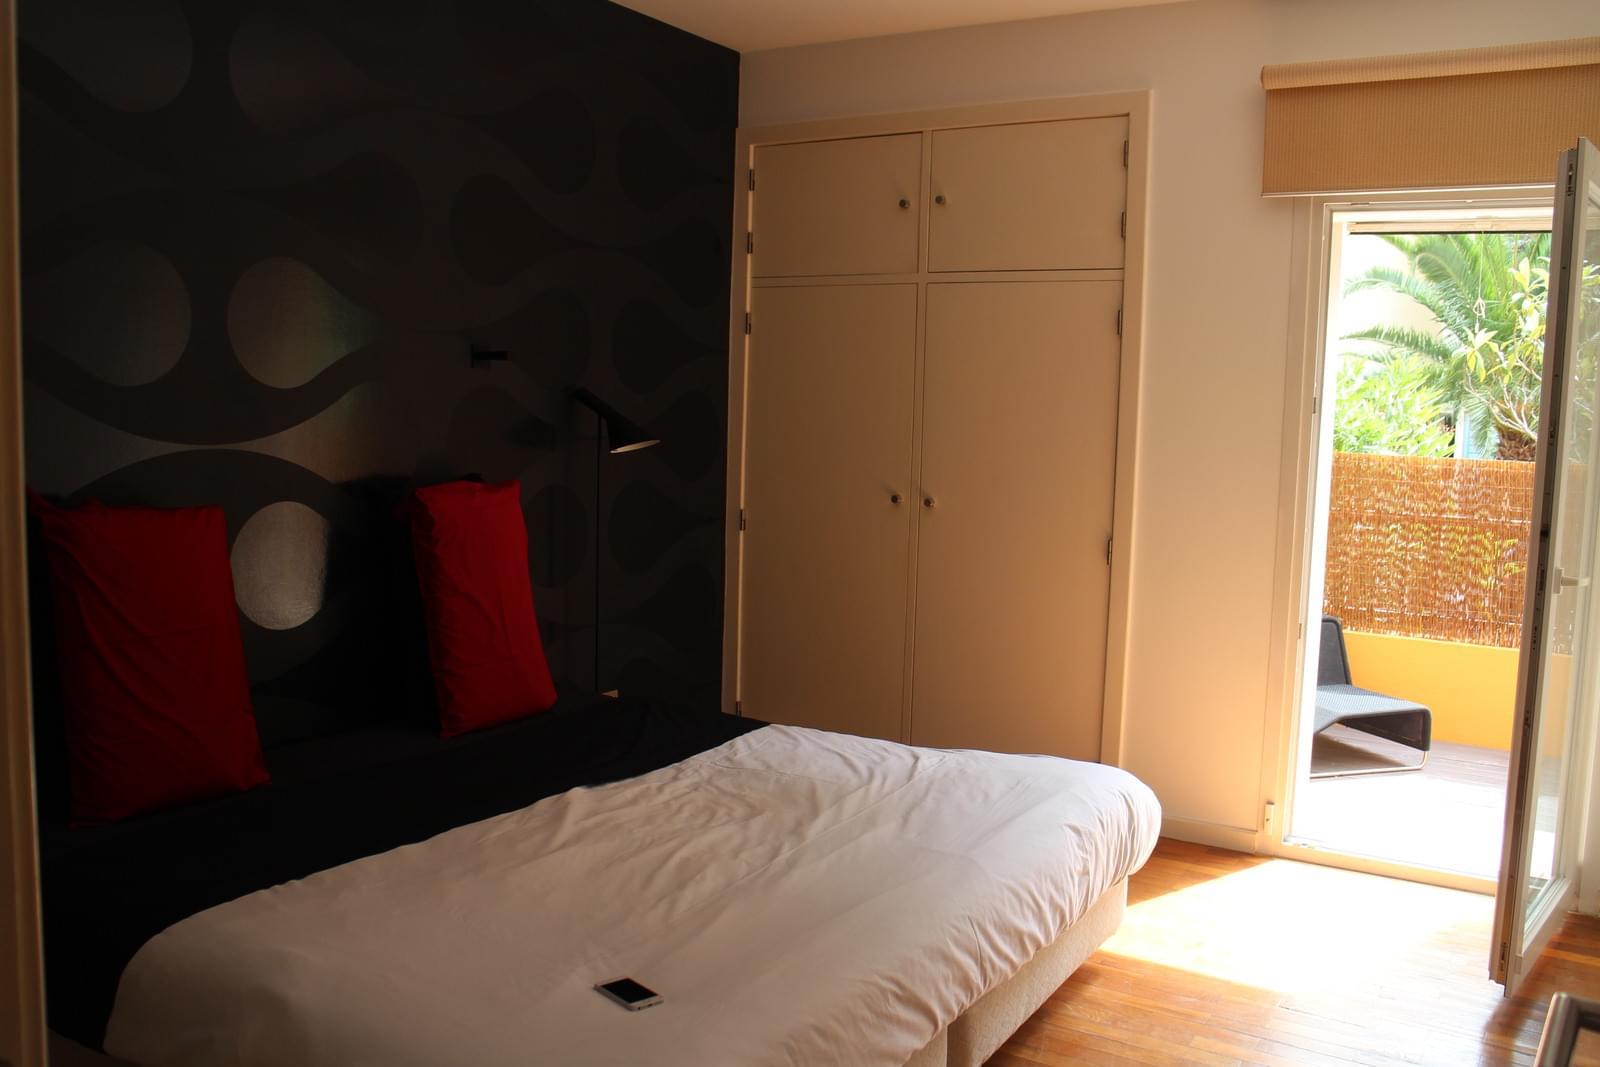 pf17538-apartamento-t2-cascais-4b66b566-7d0f-44d5-9feb-154432fb2439